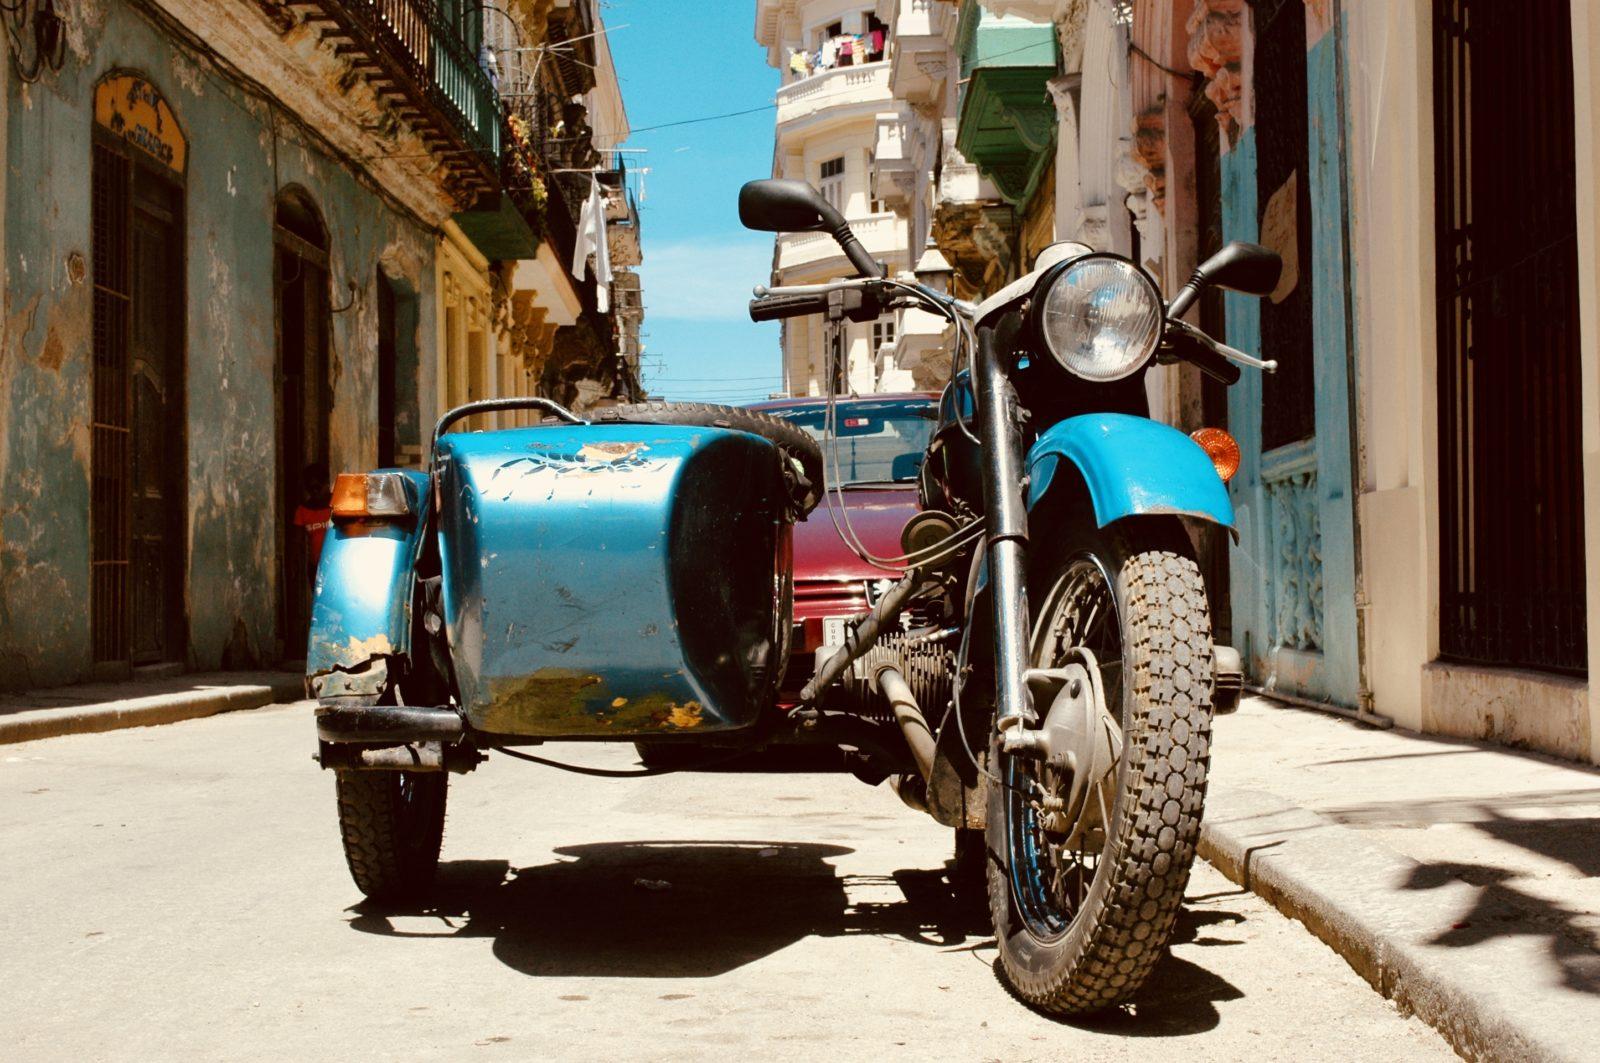 Descubre tours gratis en La Habana, Cuba, para tu viaje